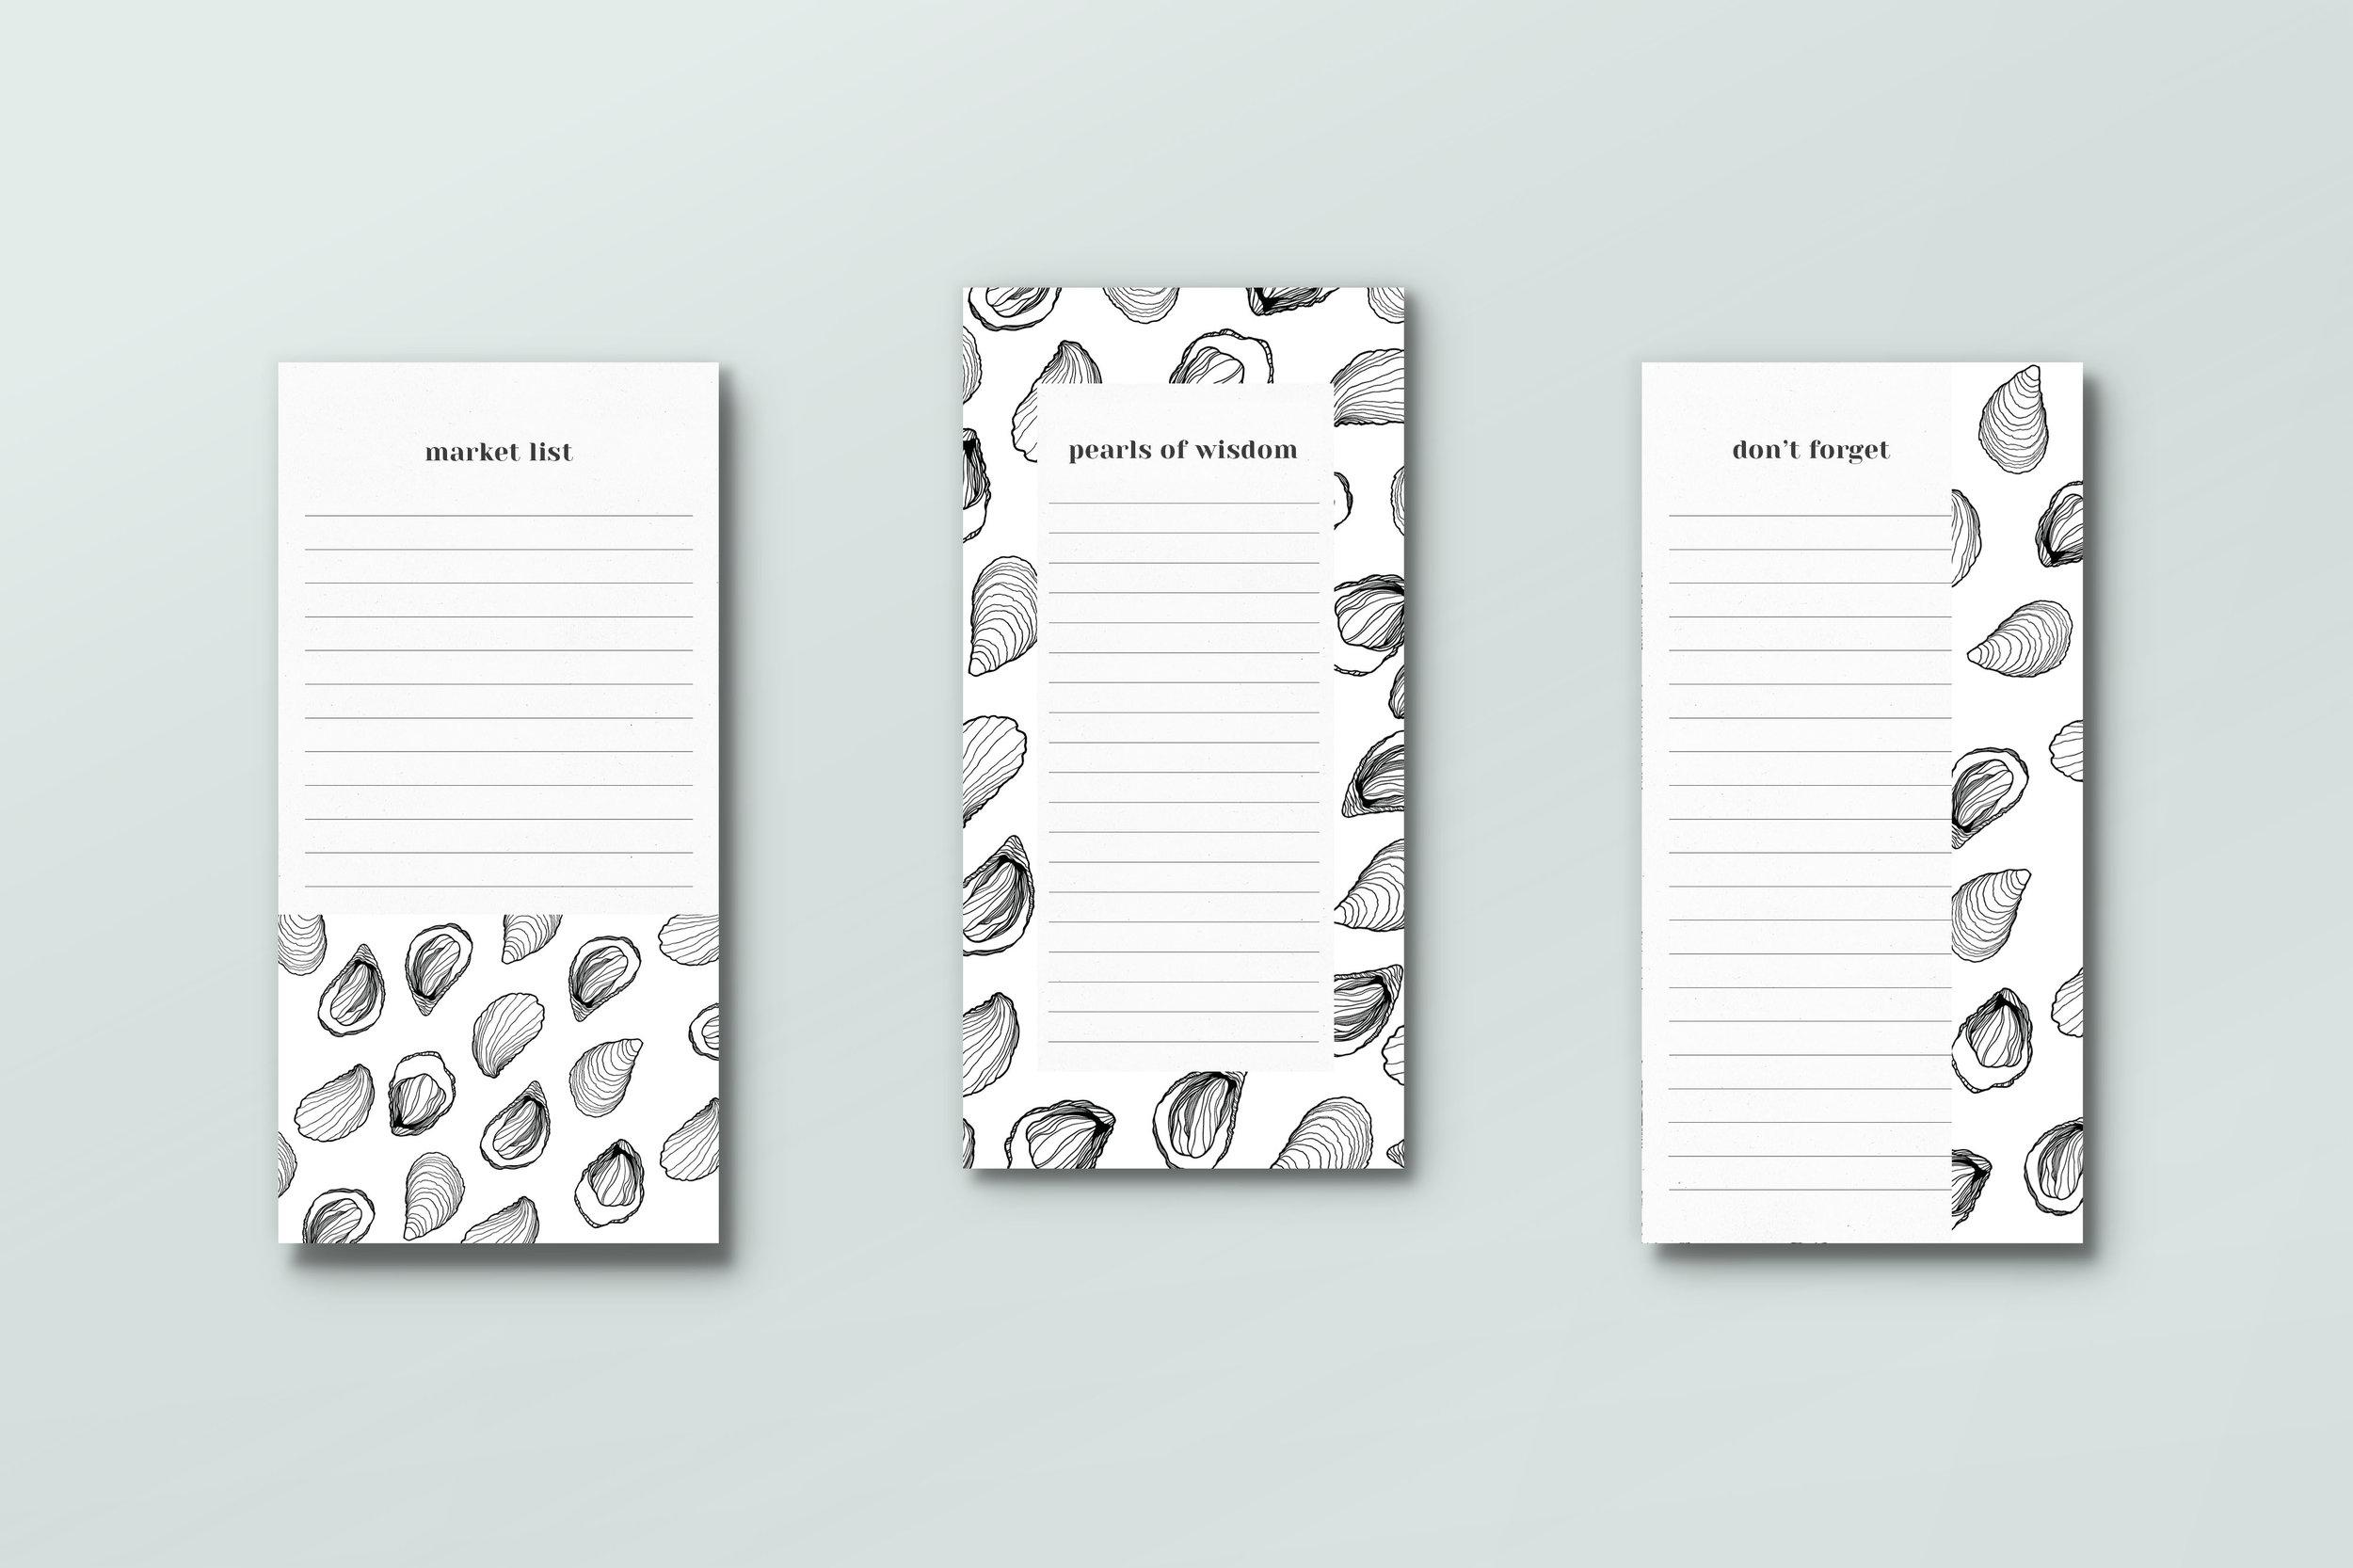 oyster-stationery-surface-pattern-design.jpg